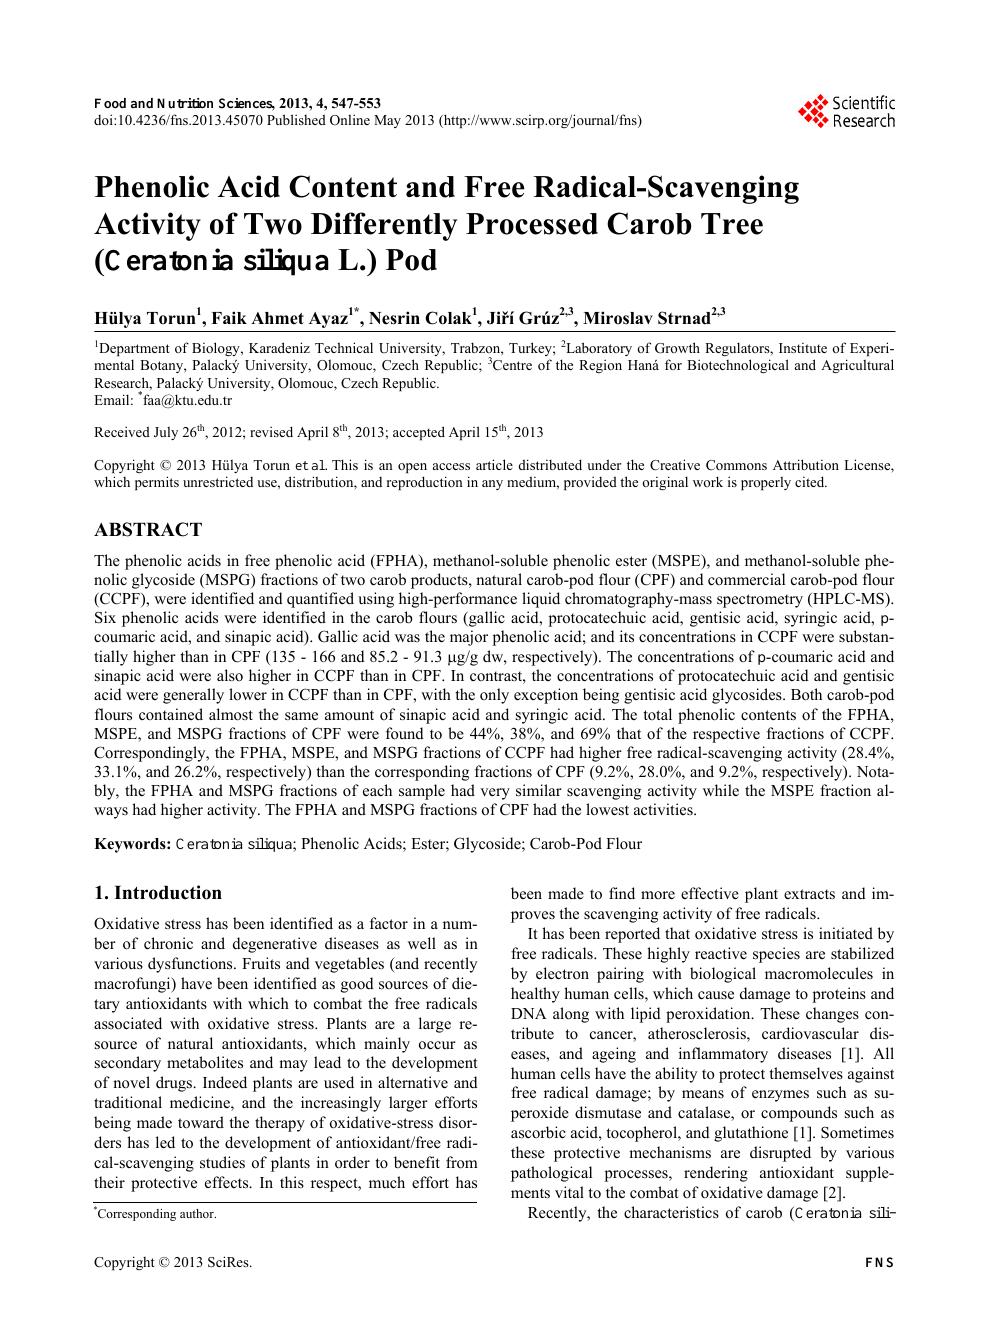 Phenolic Acid Content and Free Radical-Scavenging Activity